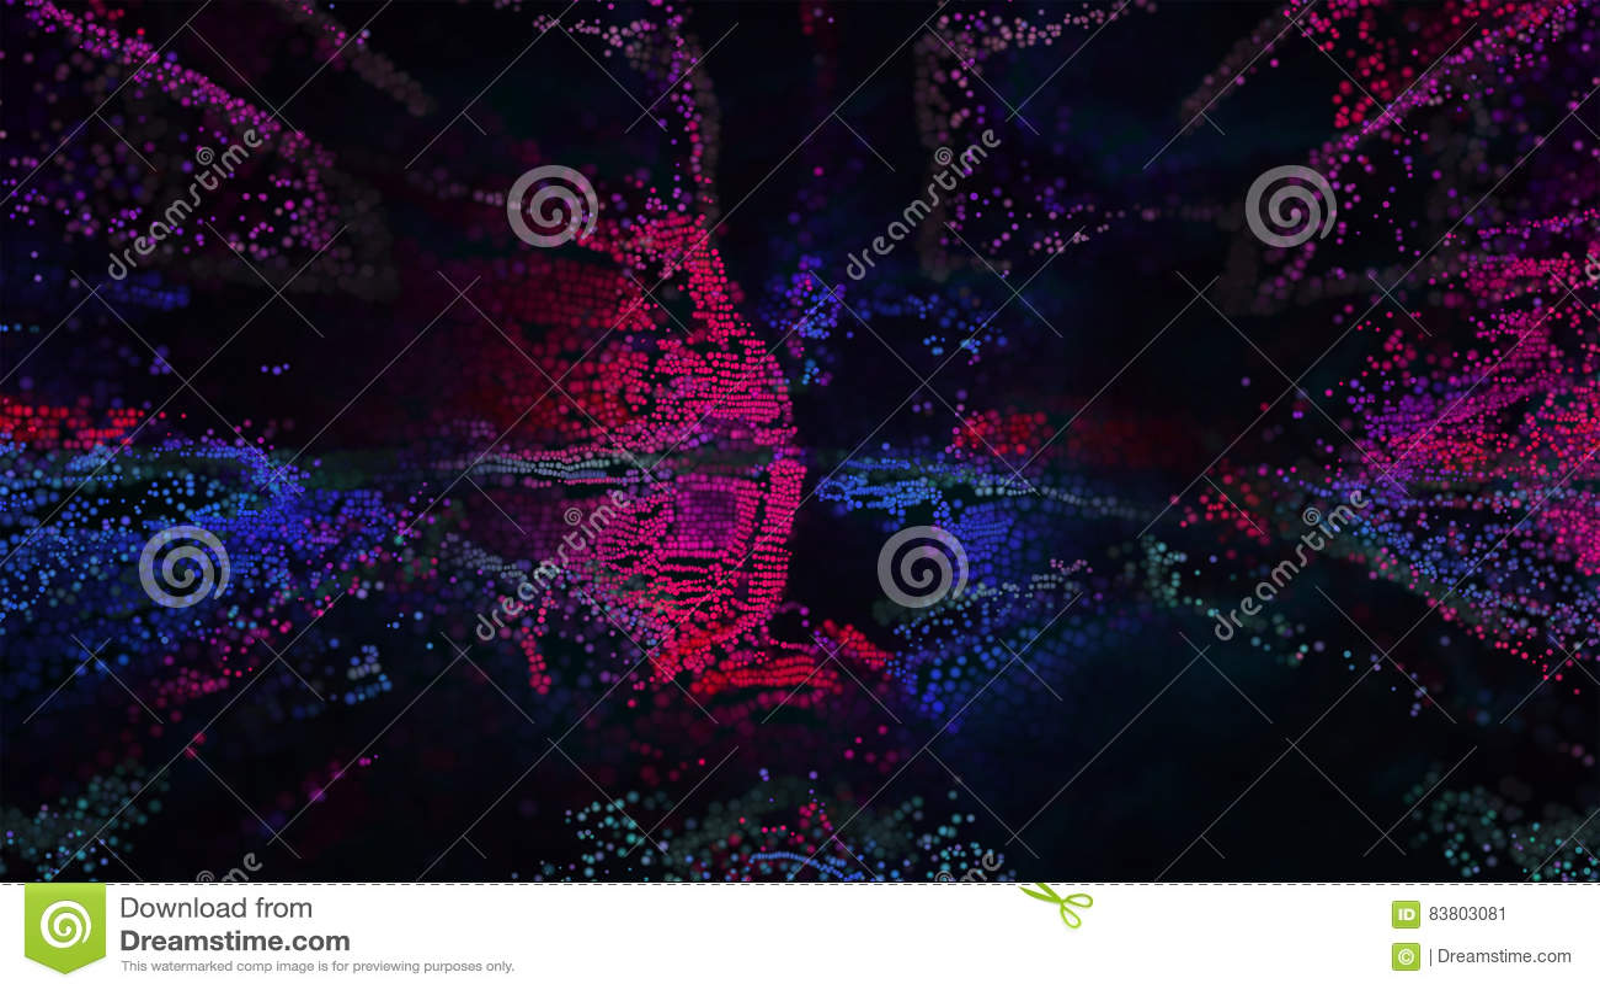 Pixel Art Abstract Background Illustration Stock